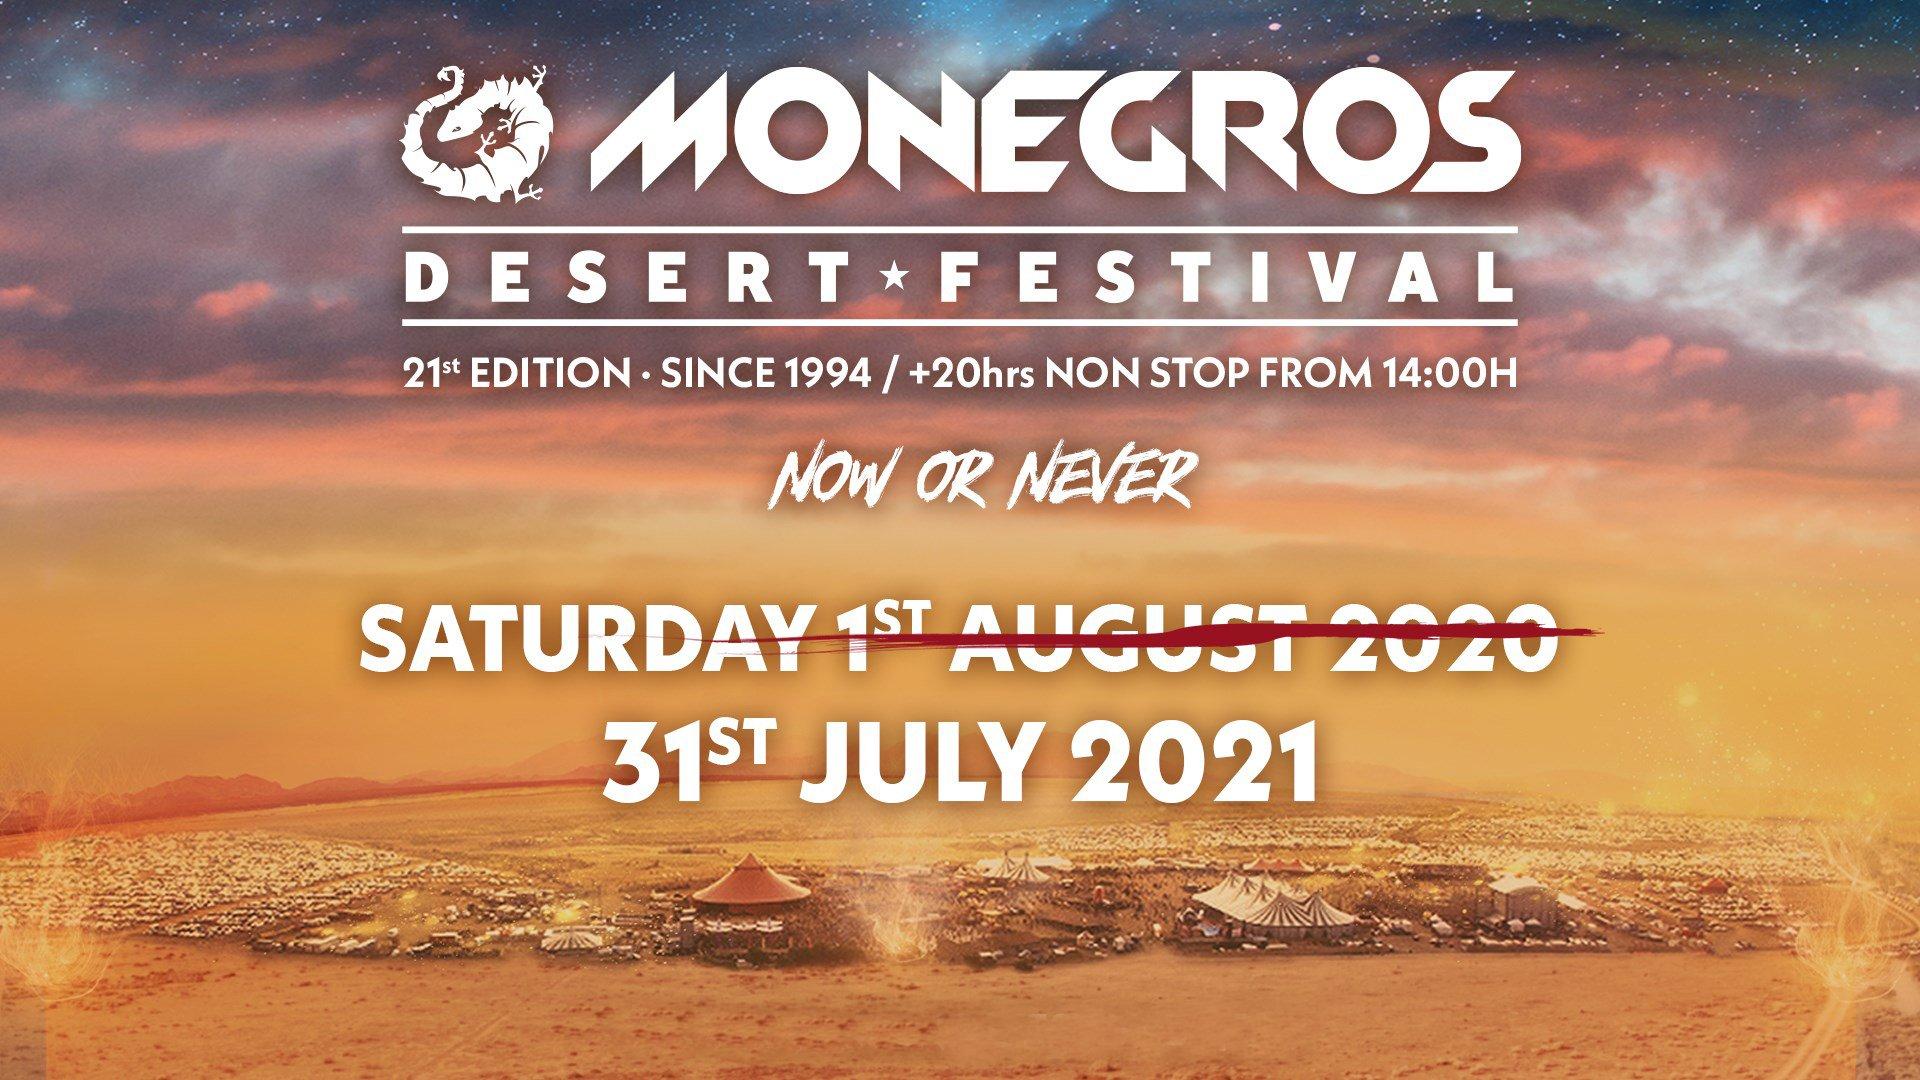 Monegros Desert Festival 2021 – Fraga Spagna – Sabato 31 Luglio 2021